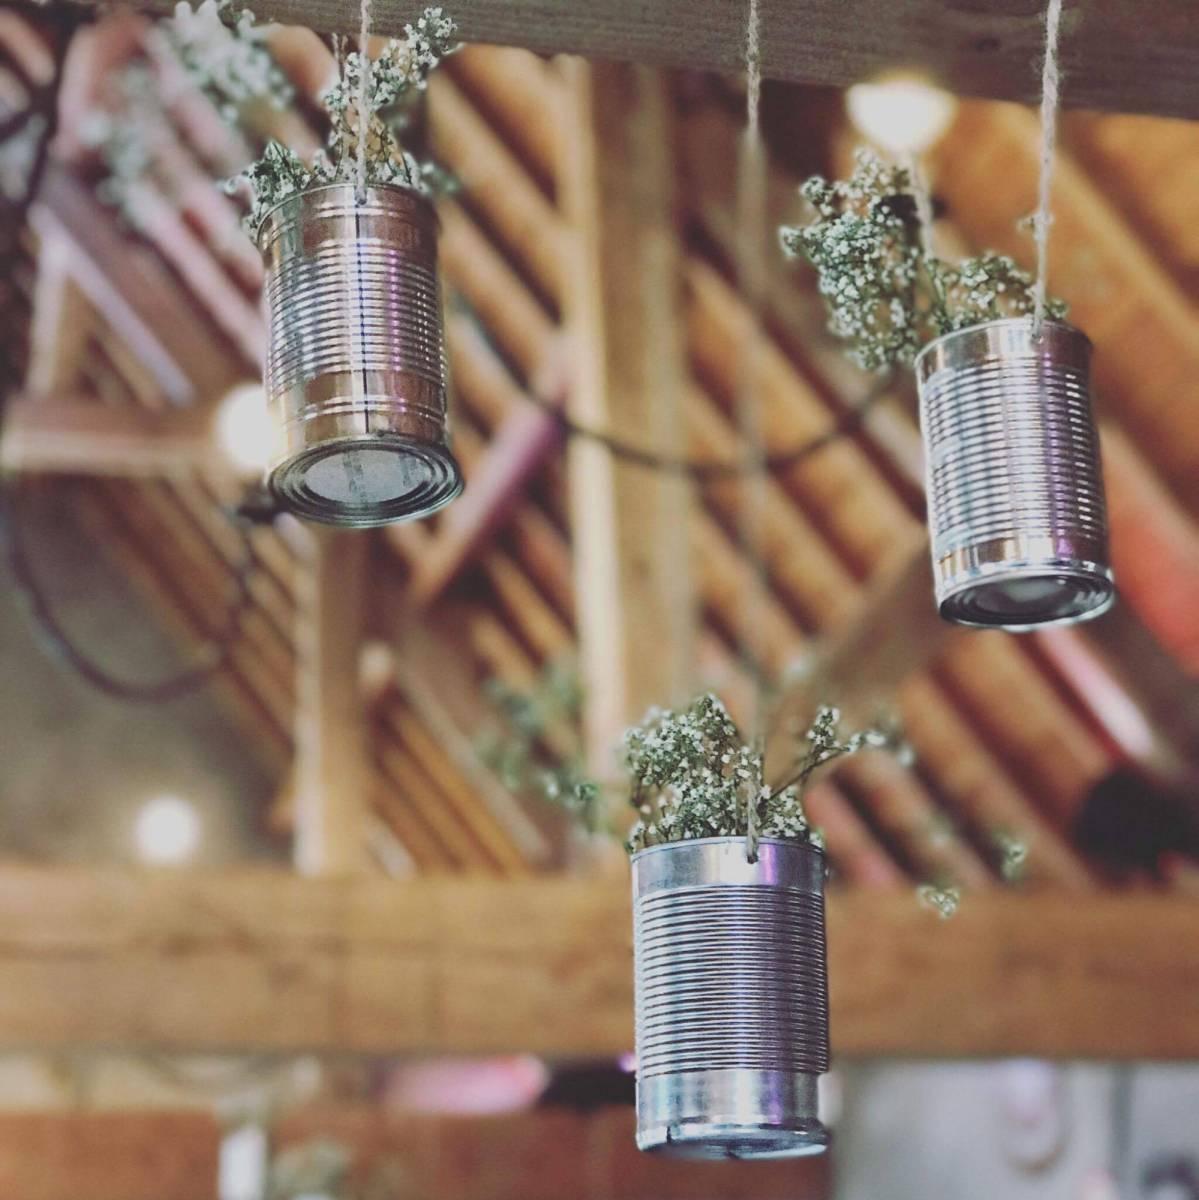 House of Weddings Domein t Eikennest Feestzaal West-Vlaanderen Diksmuide Beerst Tuin Park Vijver Tent Ceremonie Schuur pold (28)